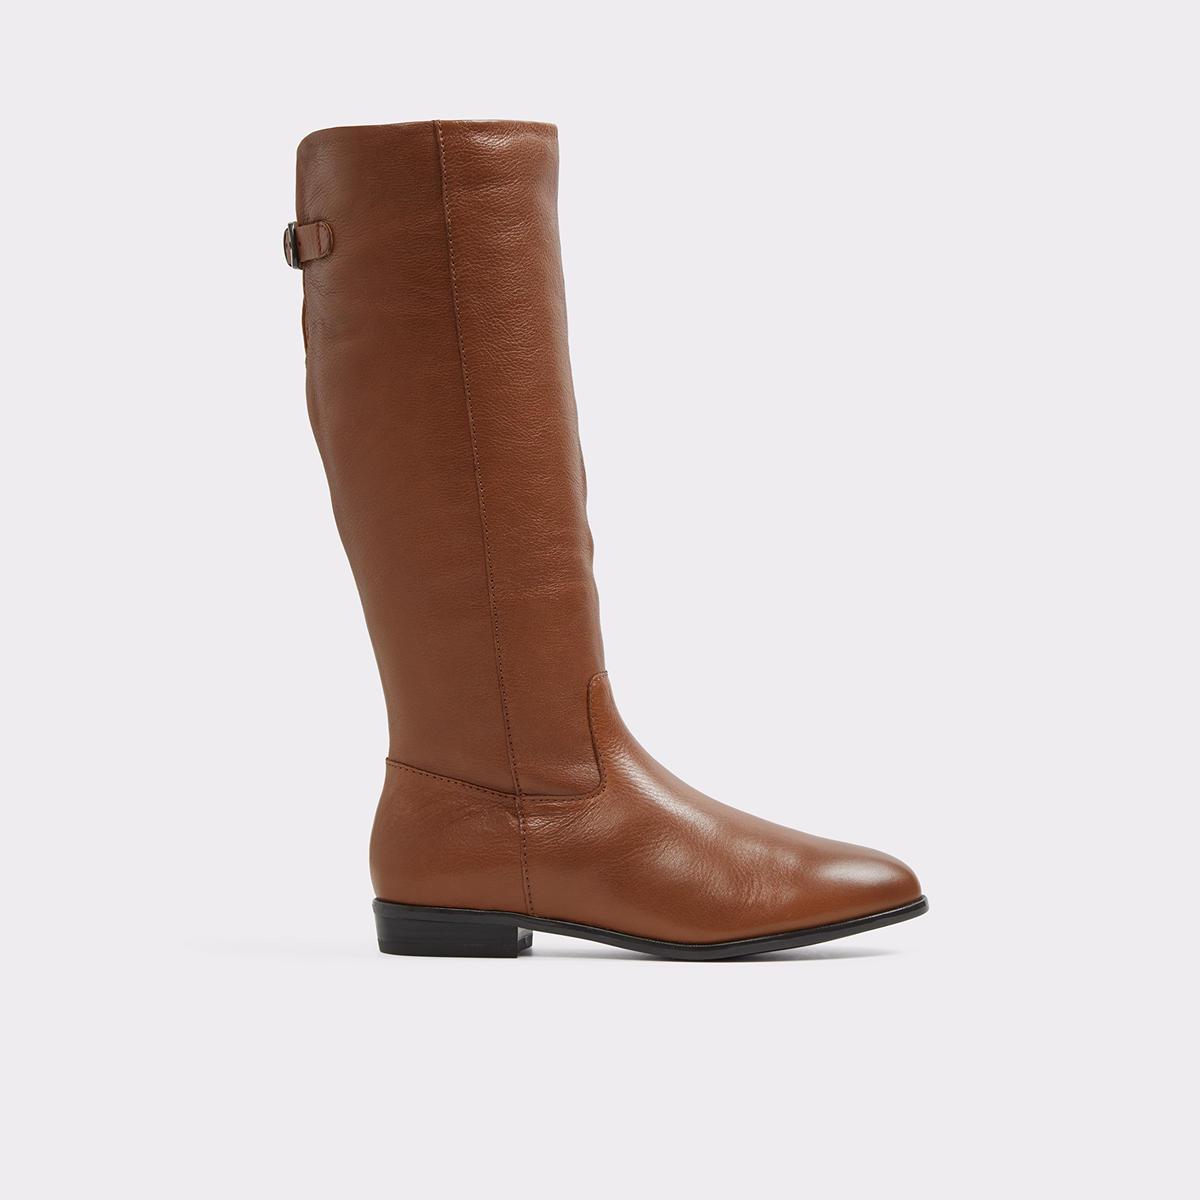 e972d9f9c7e Keesha Cognac Women s Knee-high boots